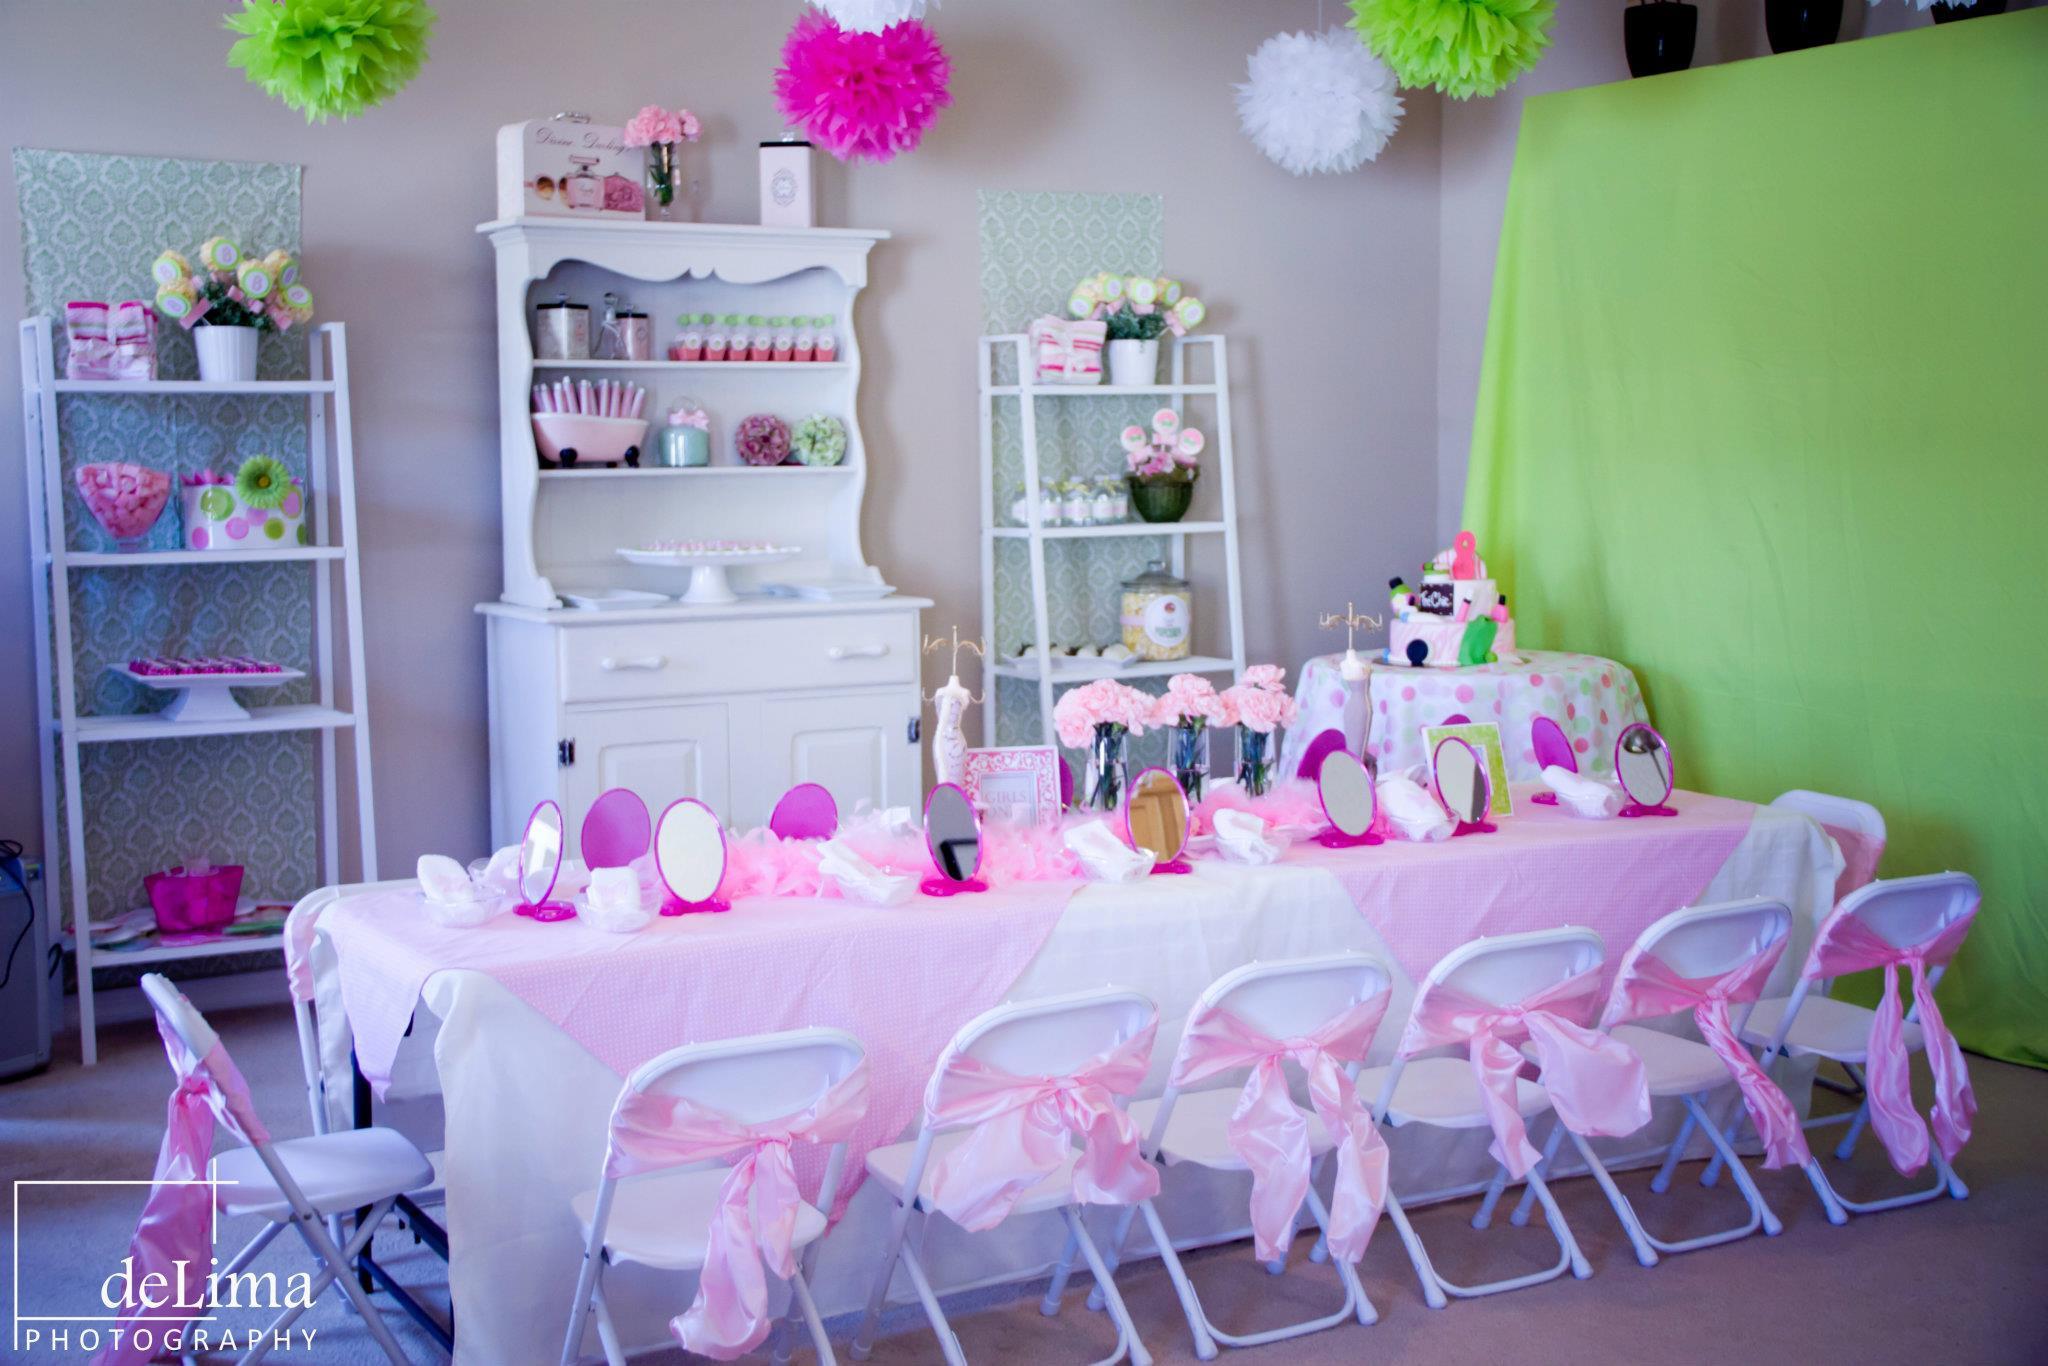 Kids Birthday Party Decoration Ideas  fundoo party decorations